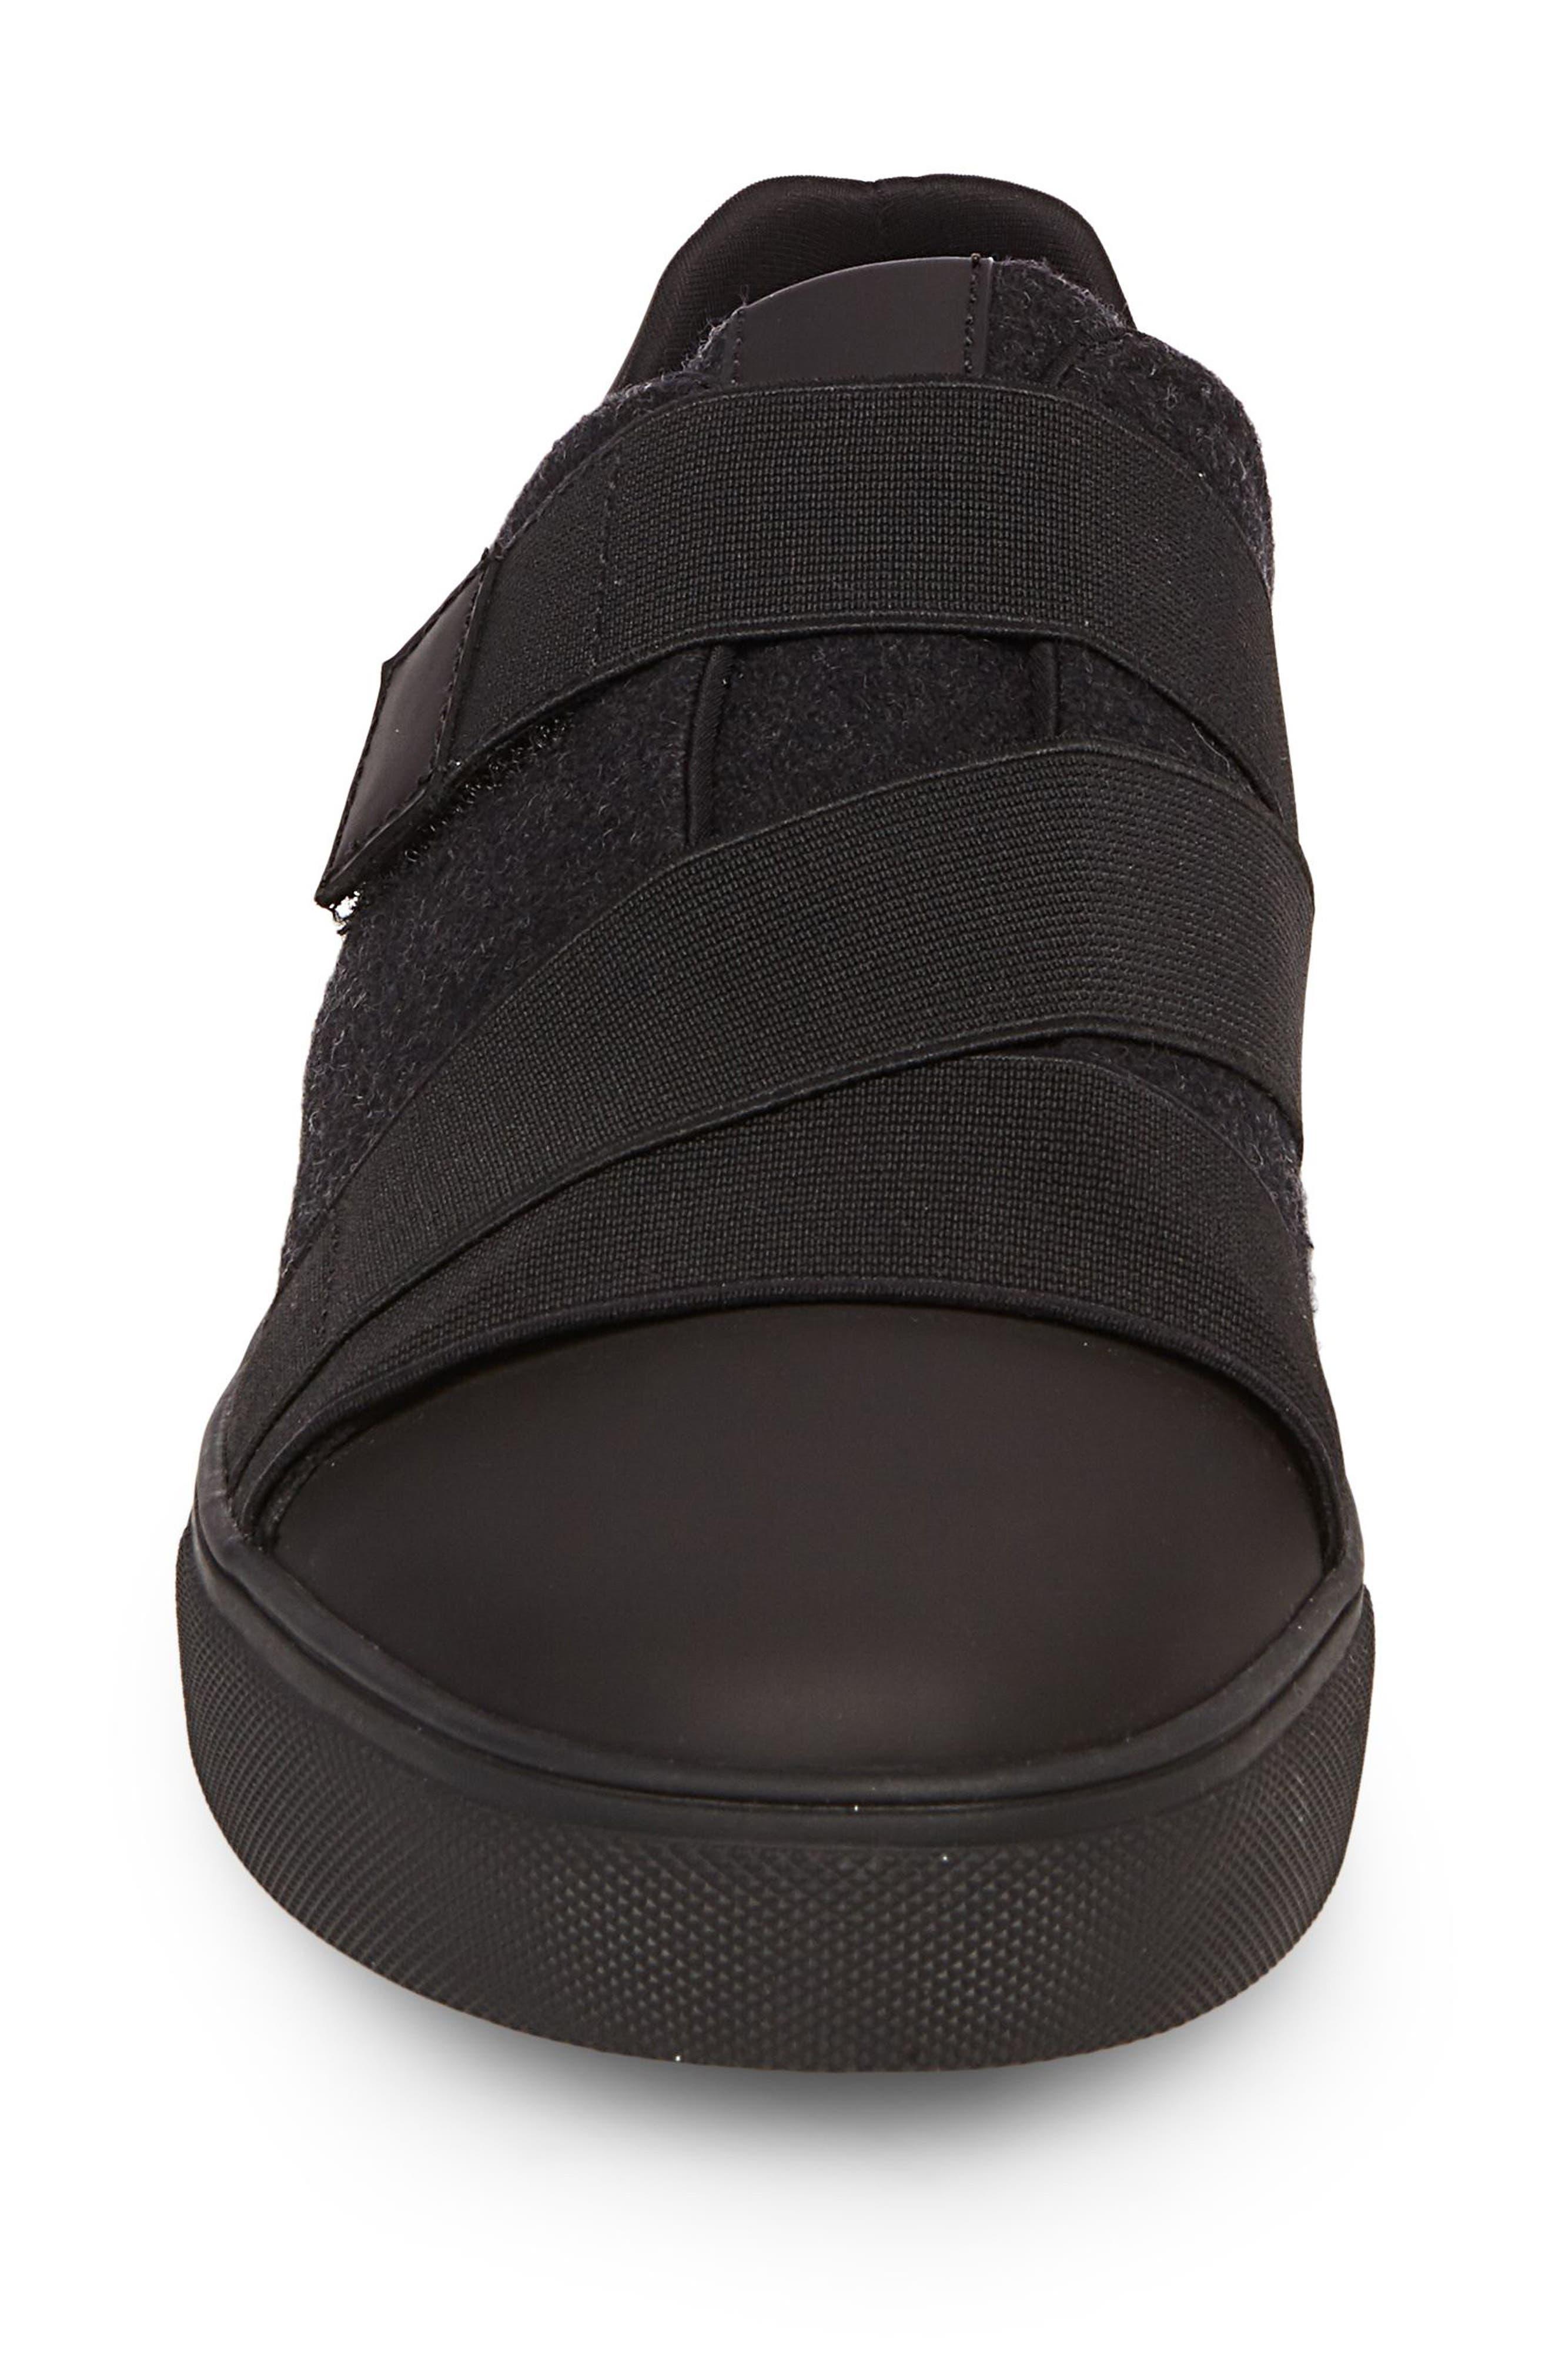 Westy Sneaker,                             Alternate thumbnail 4, color,                             002